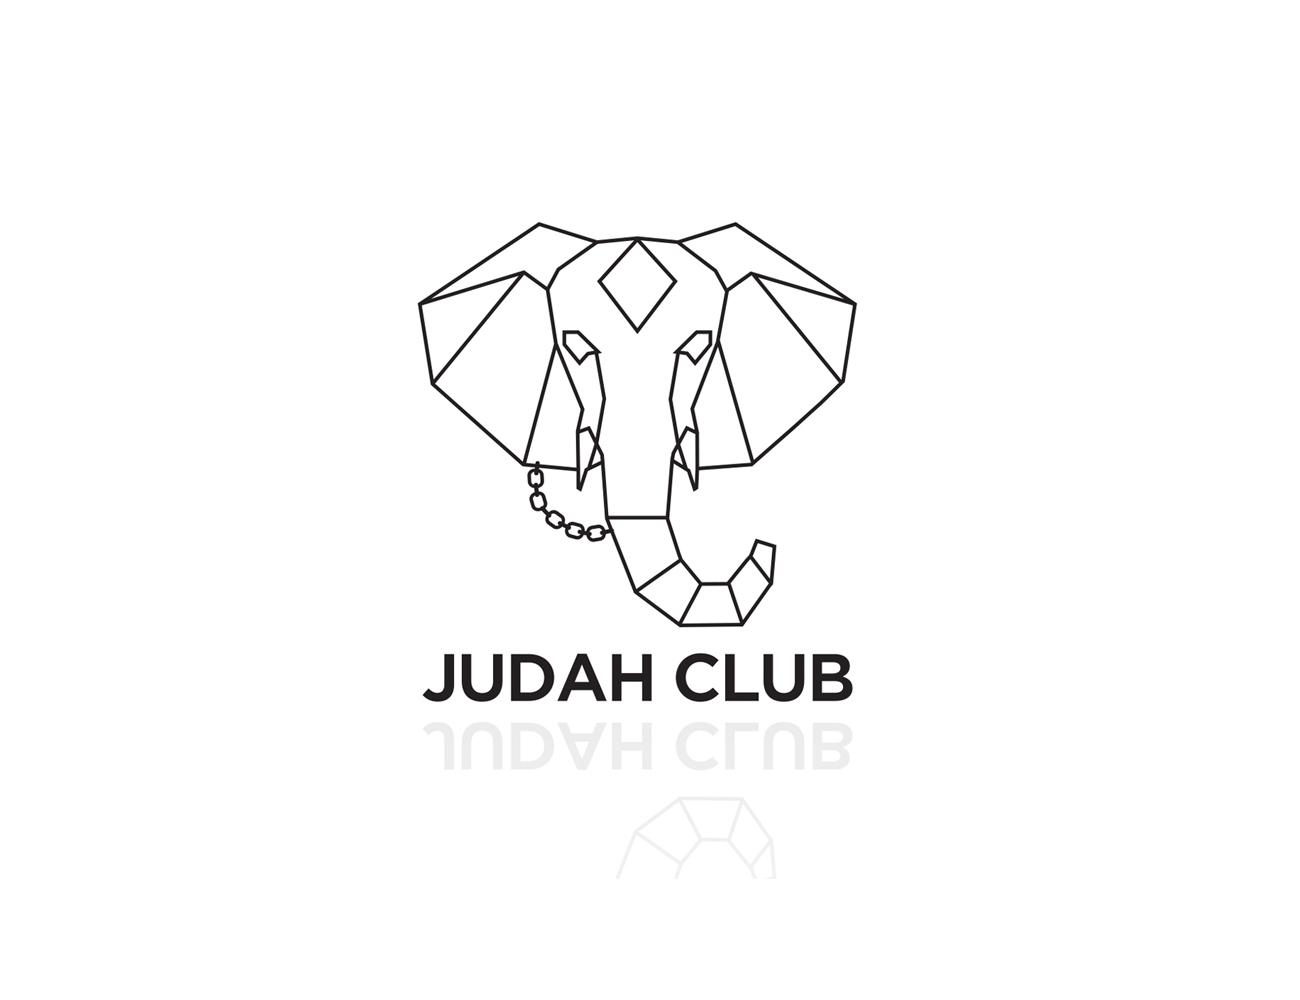 judahclublogodesign1